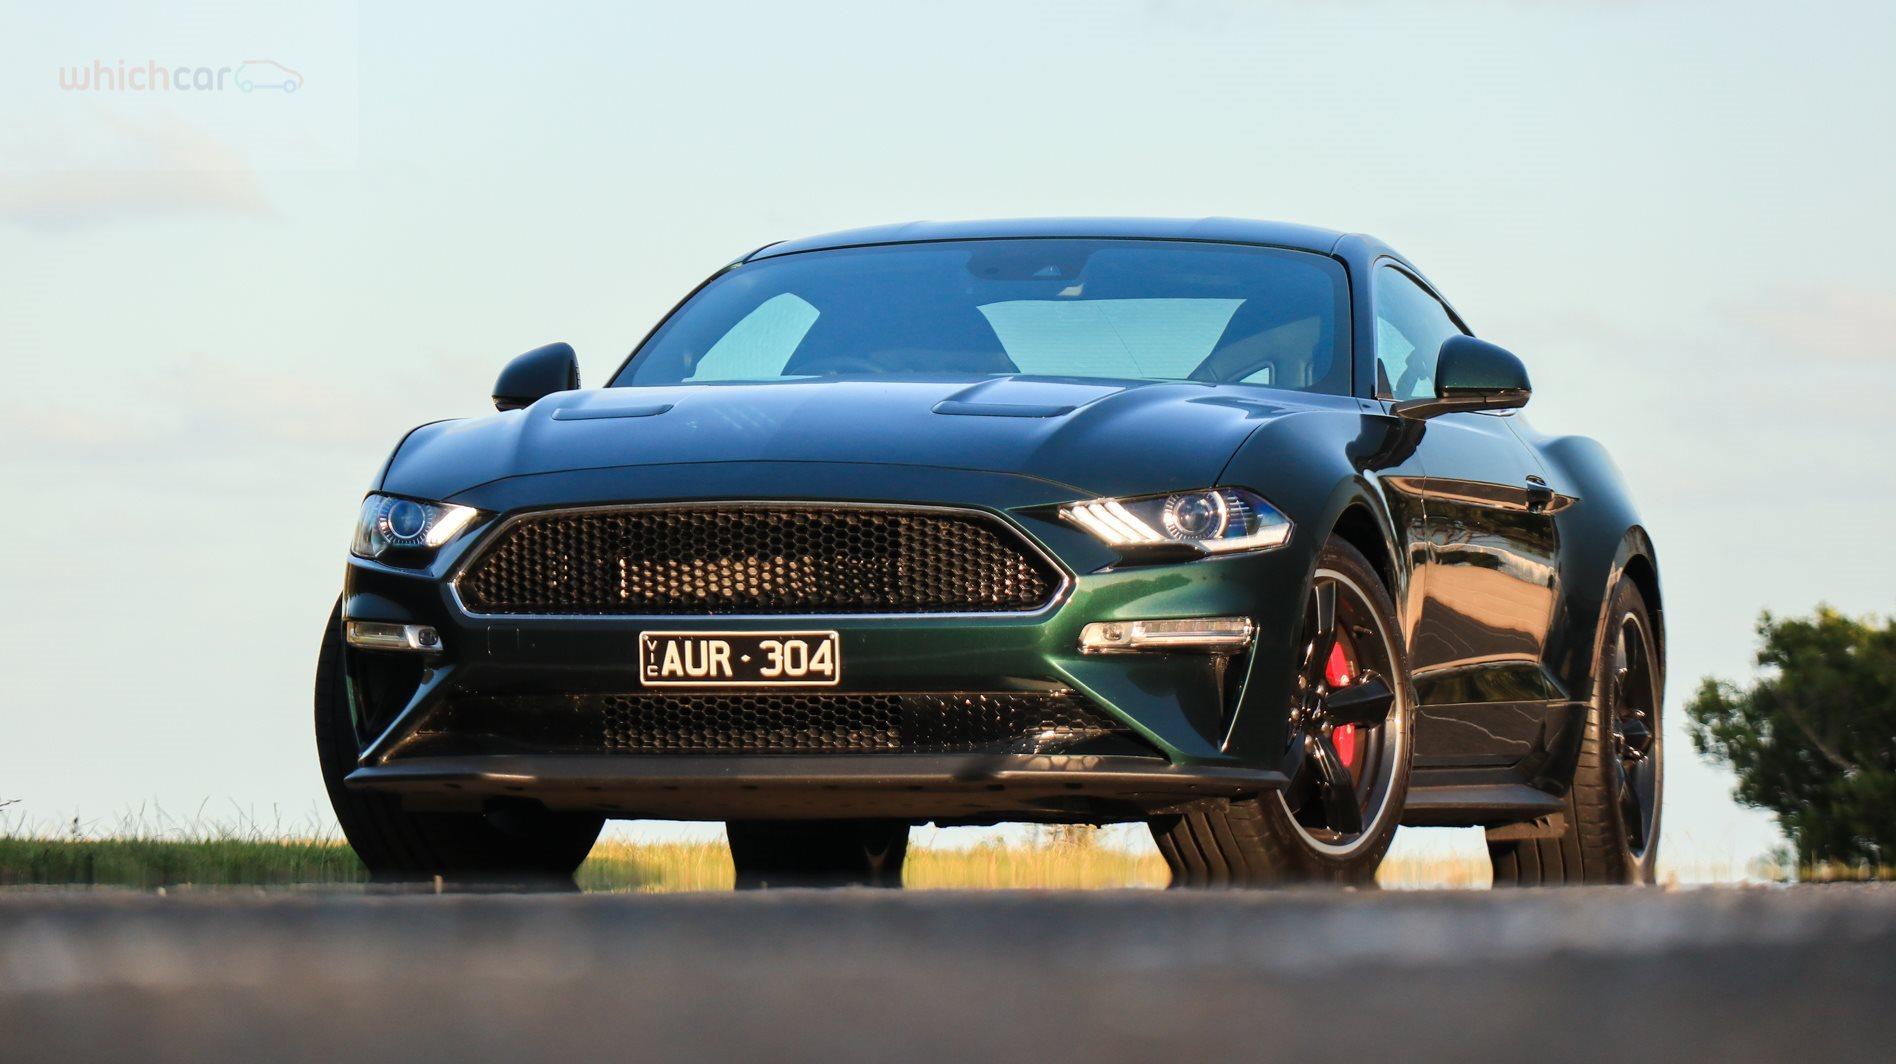 Ford confirms new Mustang Bullitt allocation is not for Australia